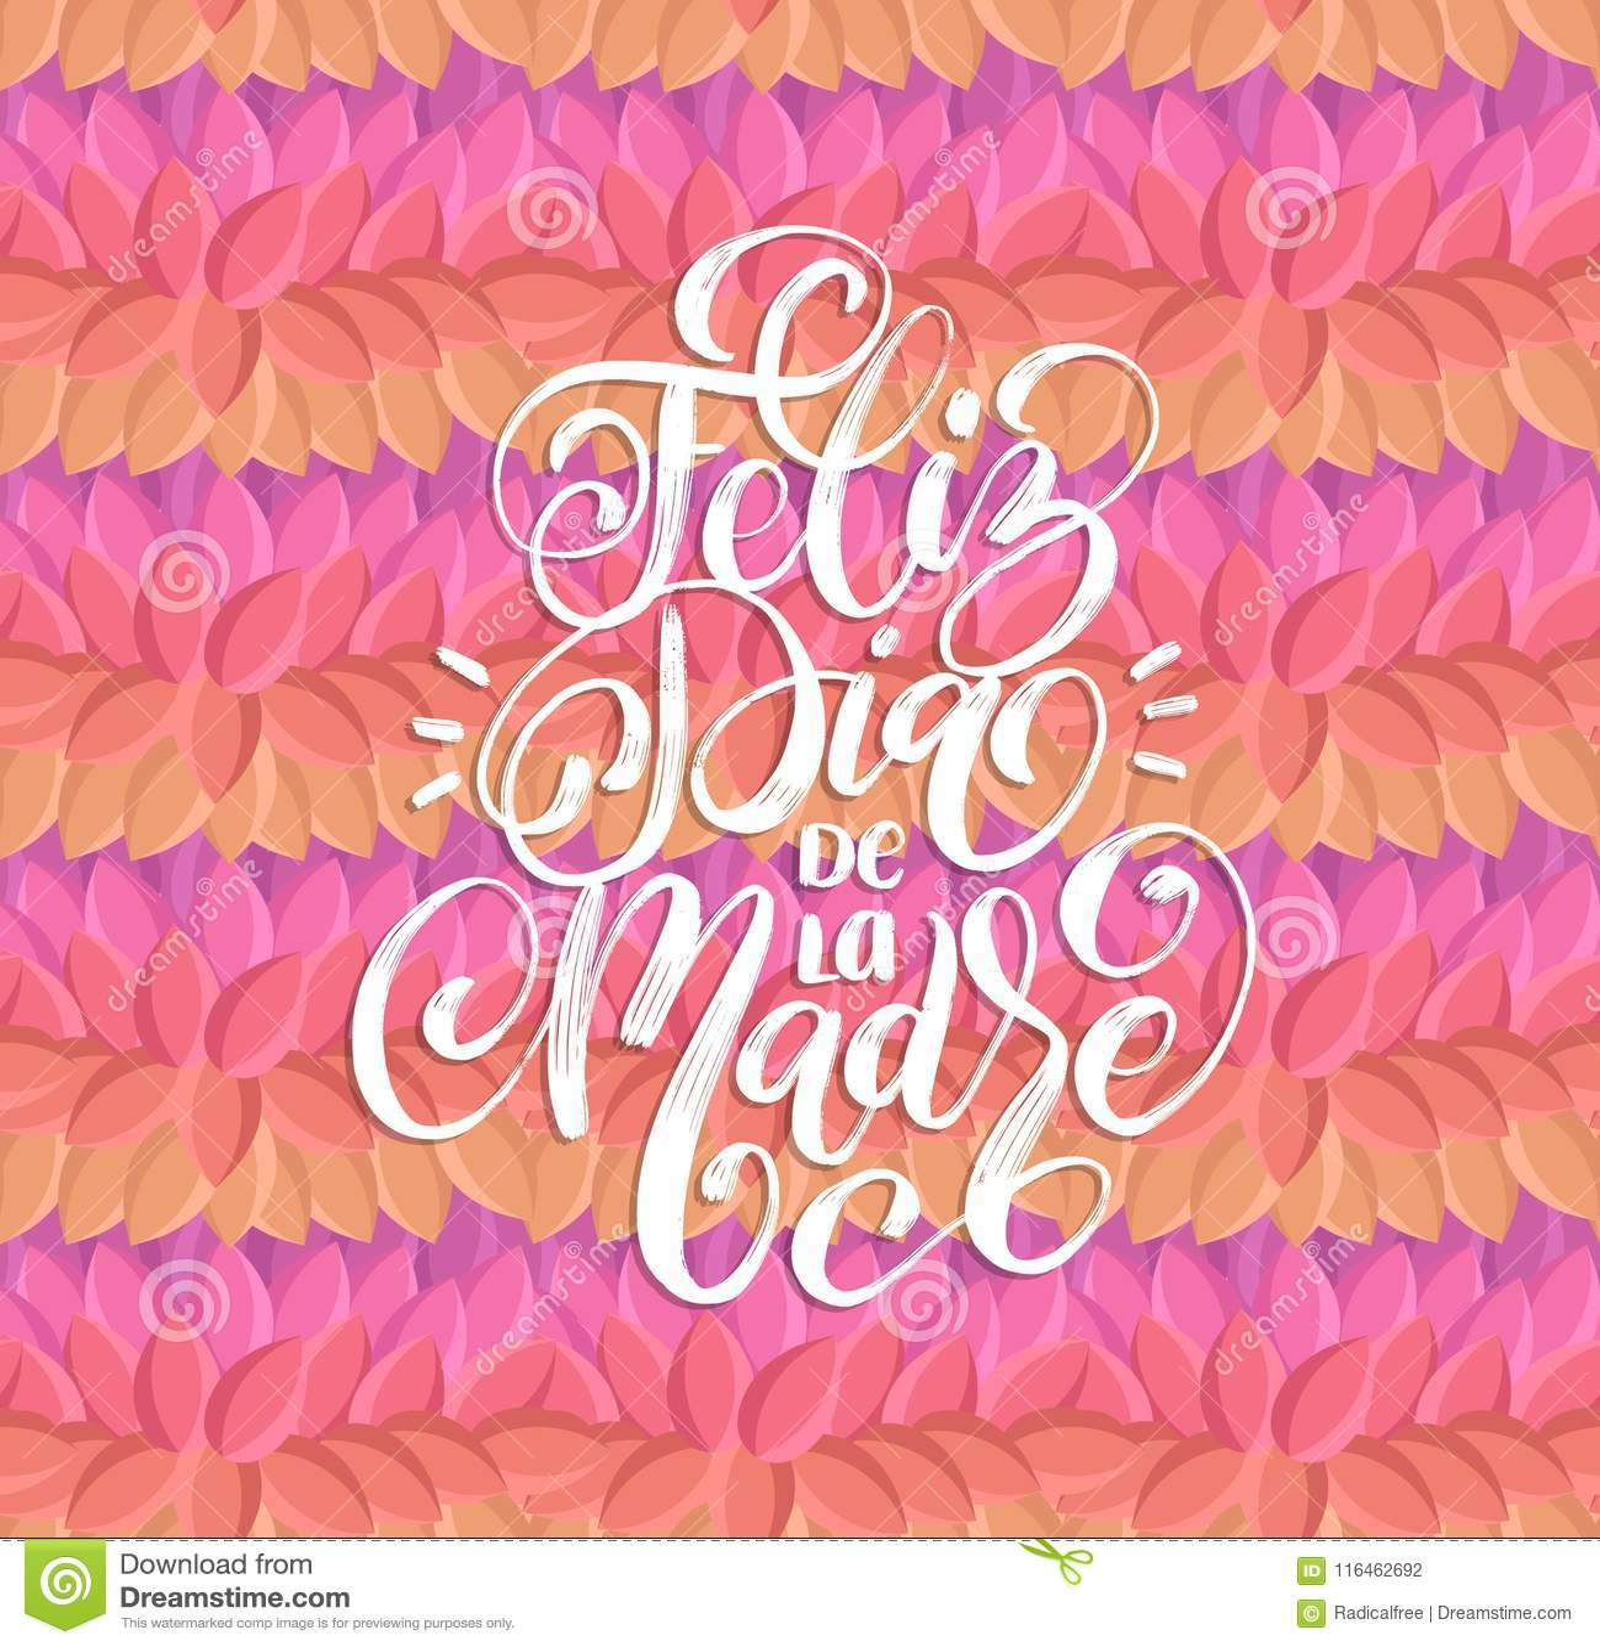 Feliz Dia De La Madre Hand Lettering Translation From